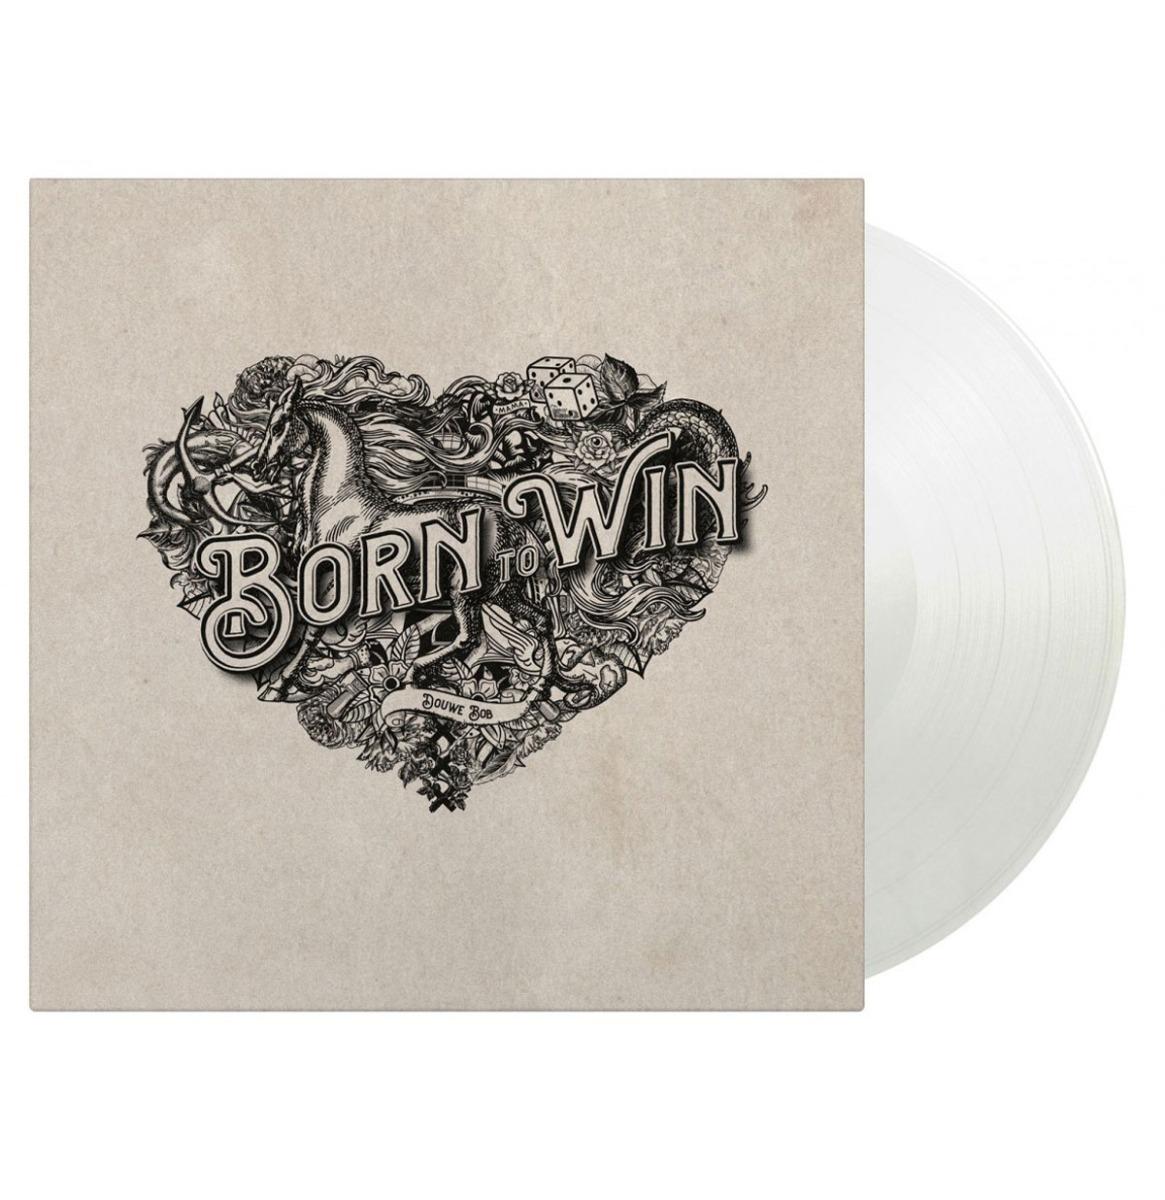 Douwe Bob - Born To Win, Born To Lose (Clear Vinyl) LP